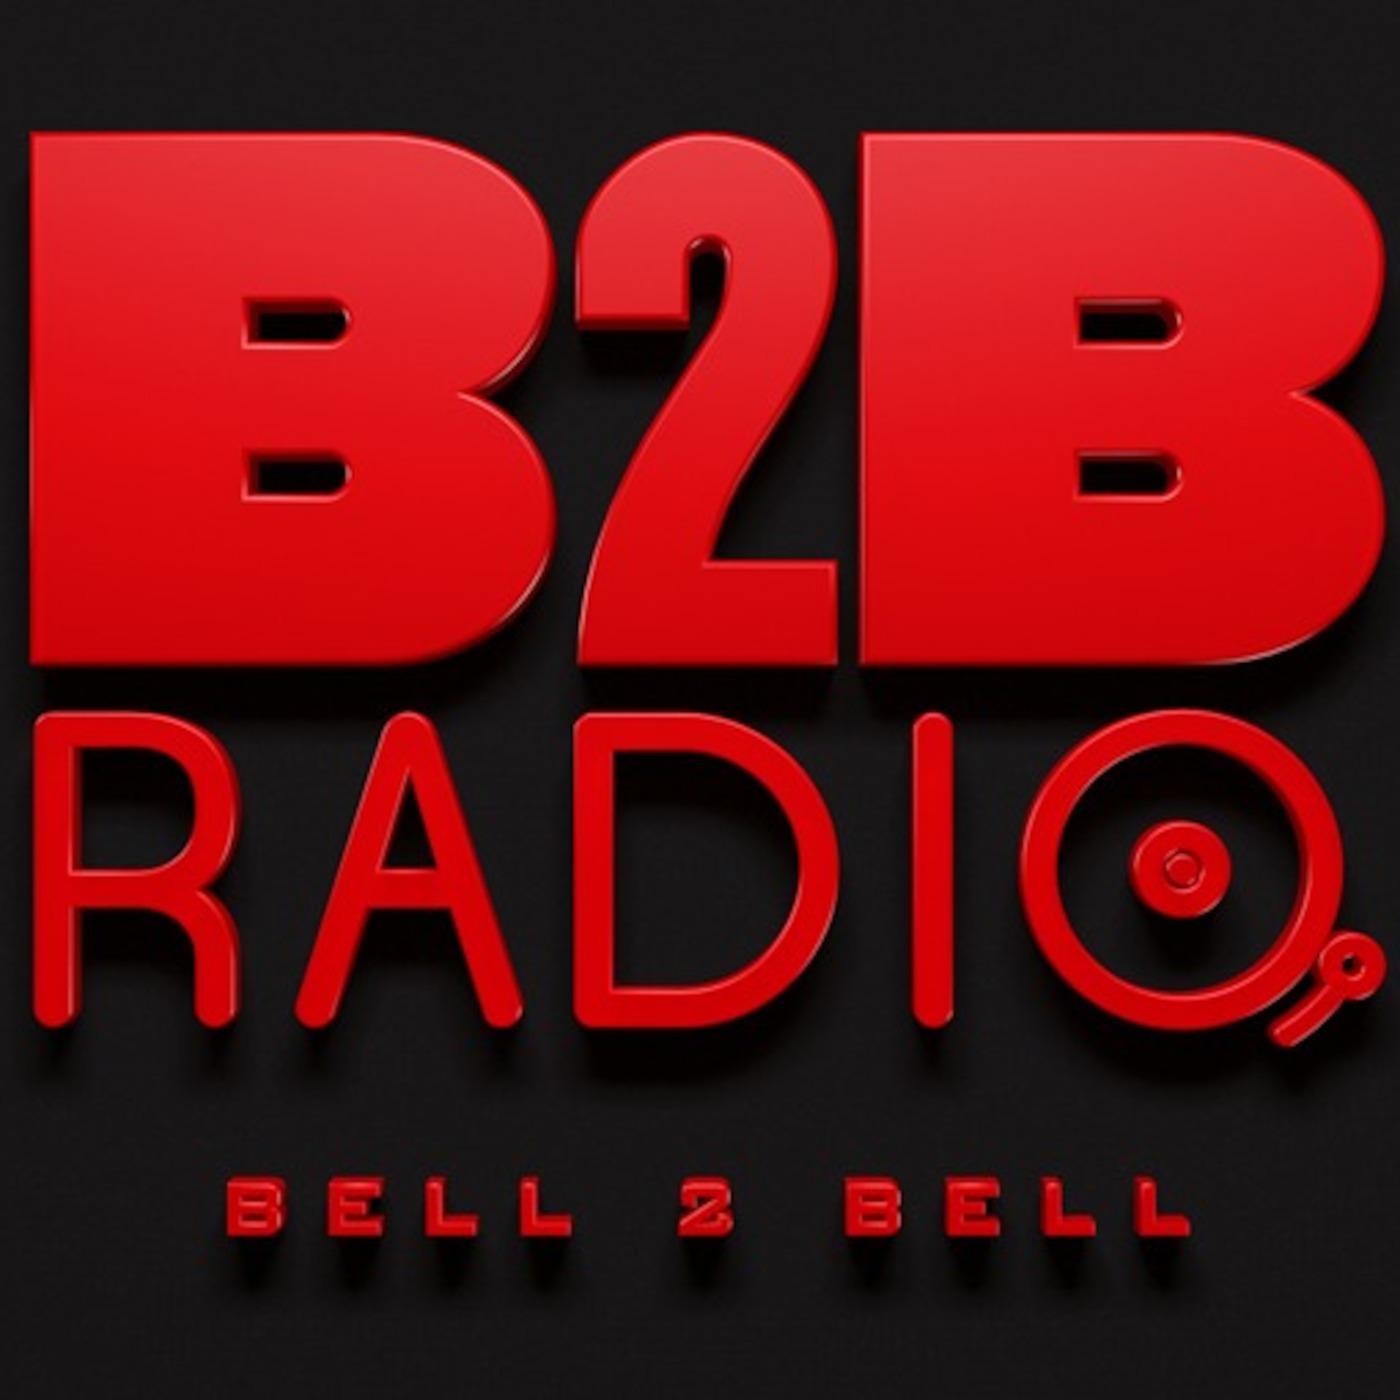 Bell 2 Bell Radio